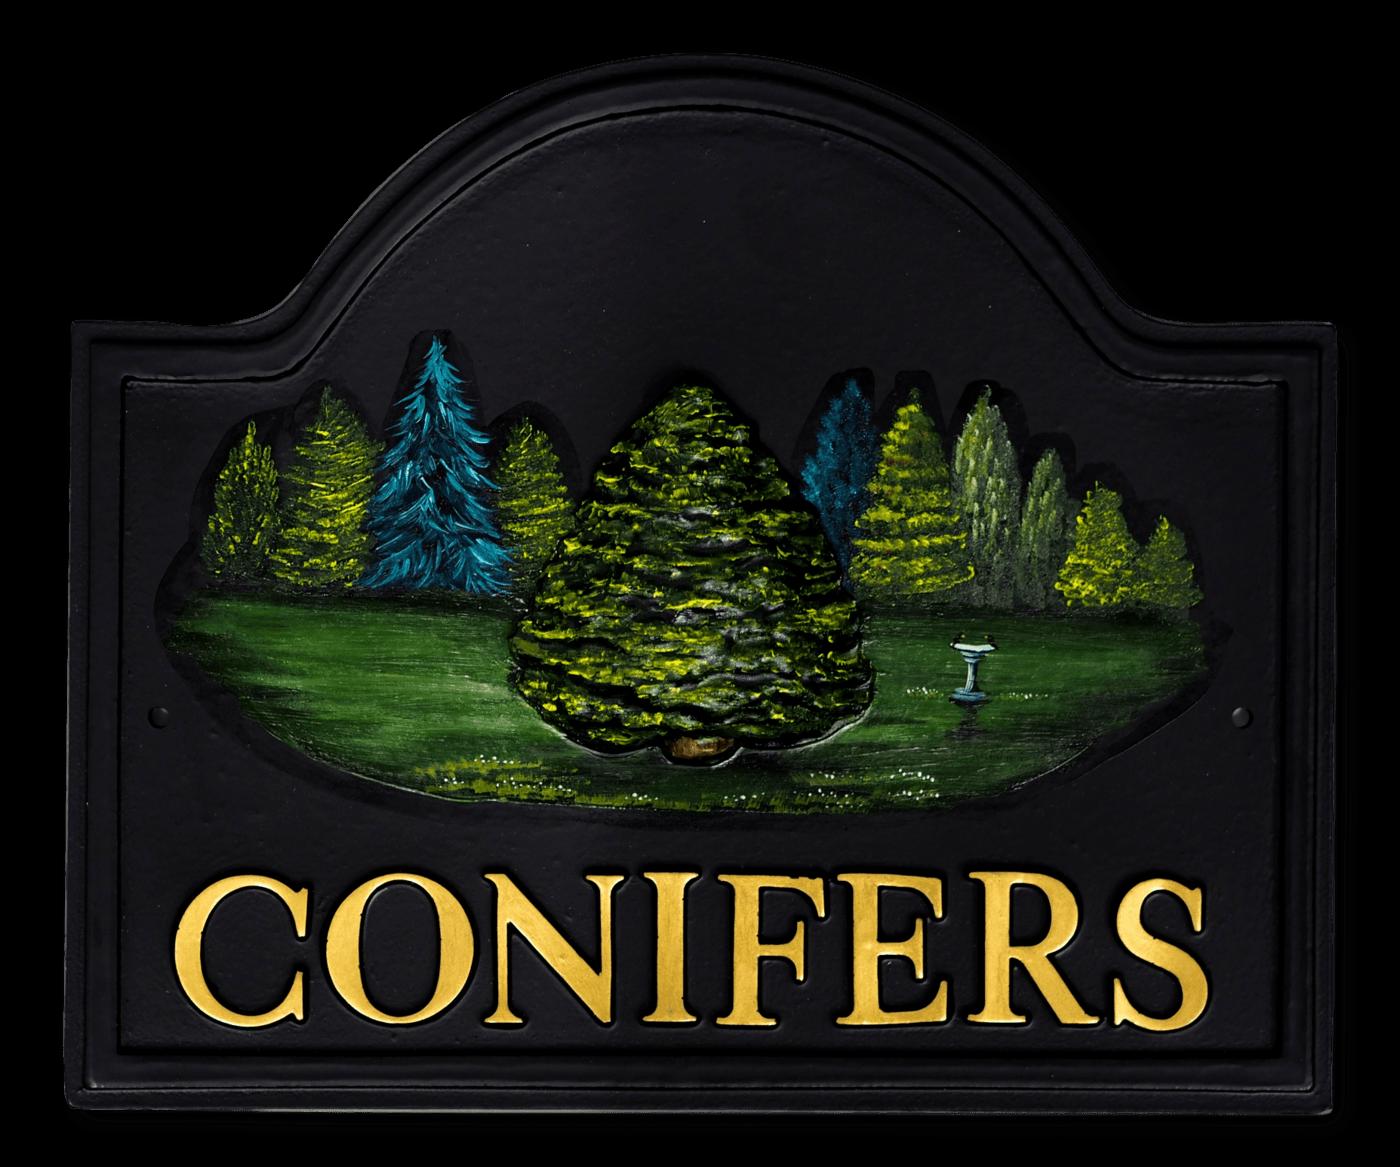 Conifer house sign